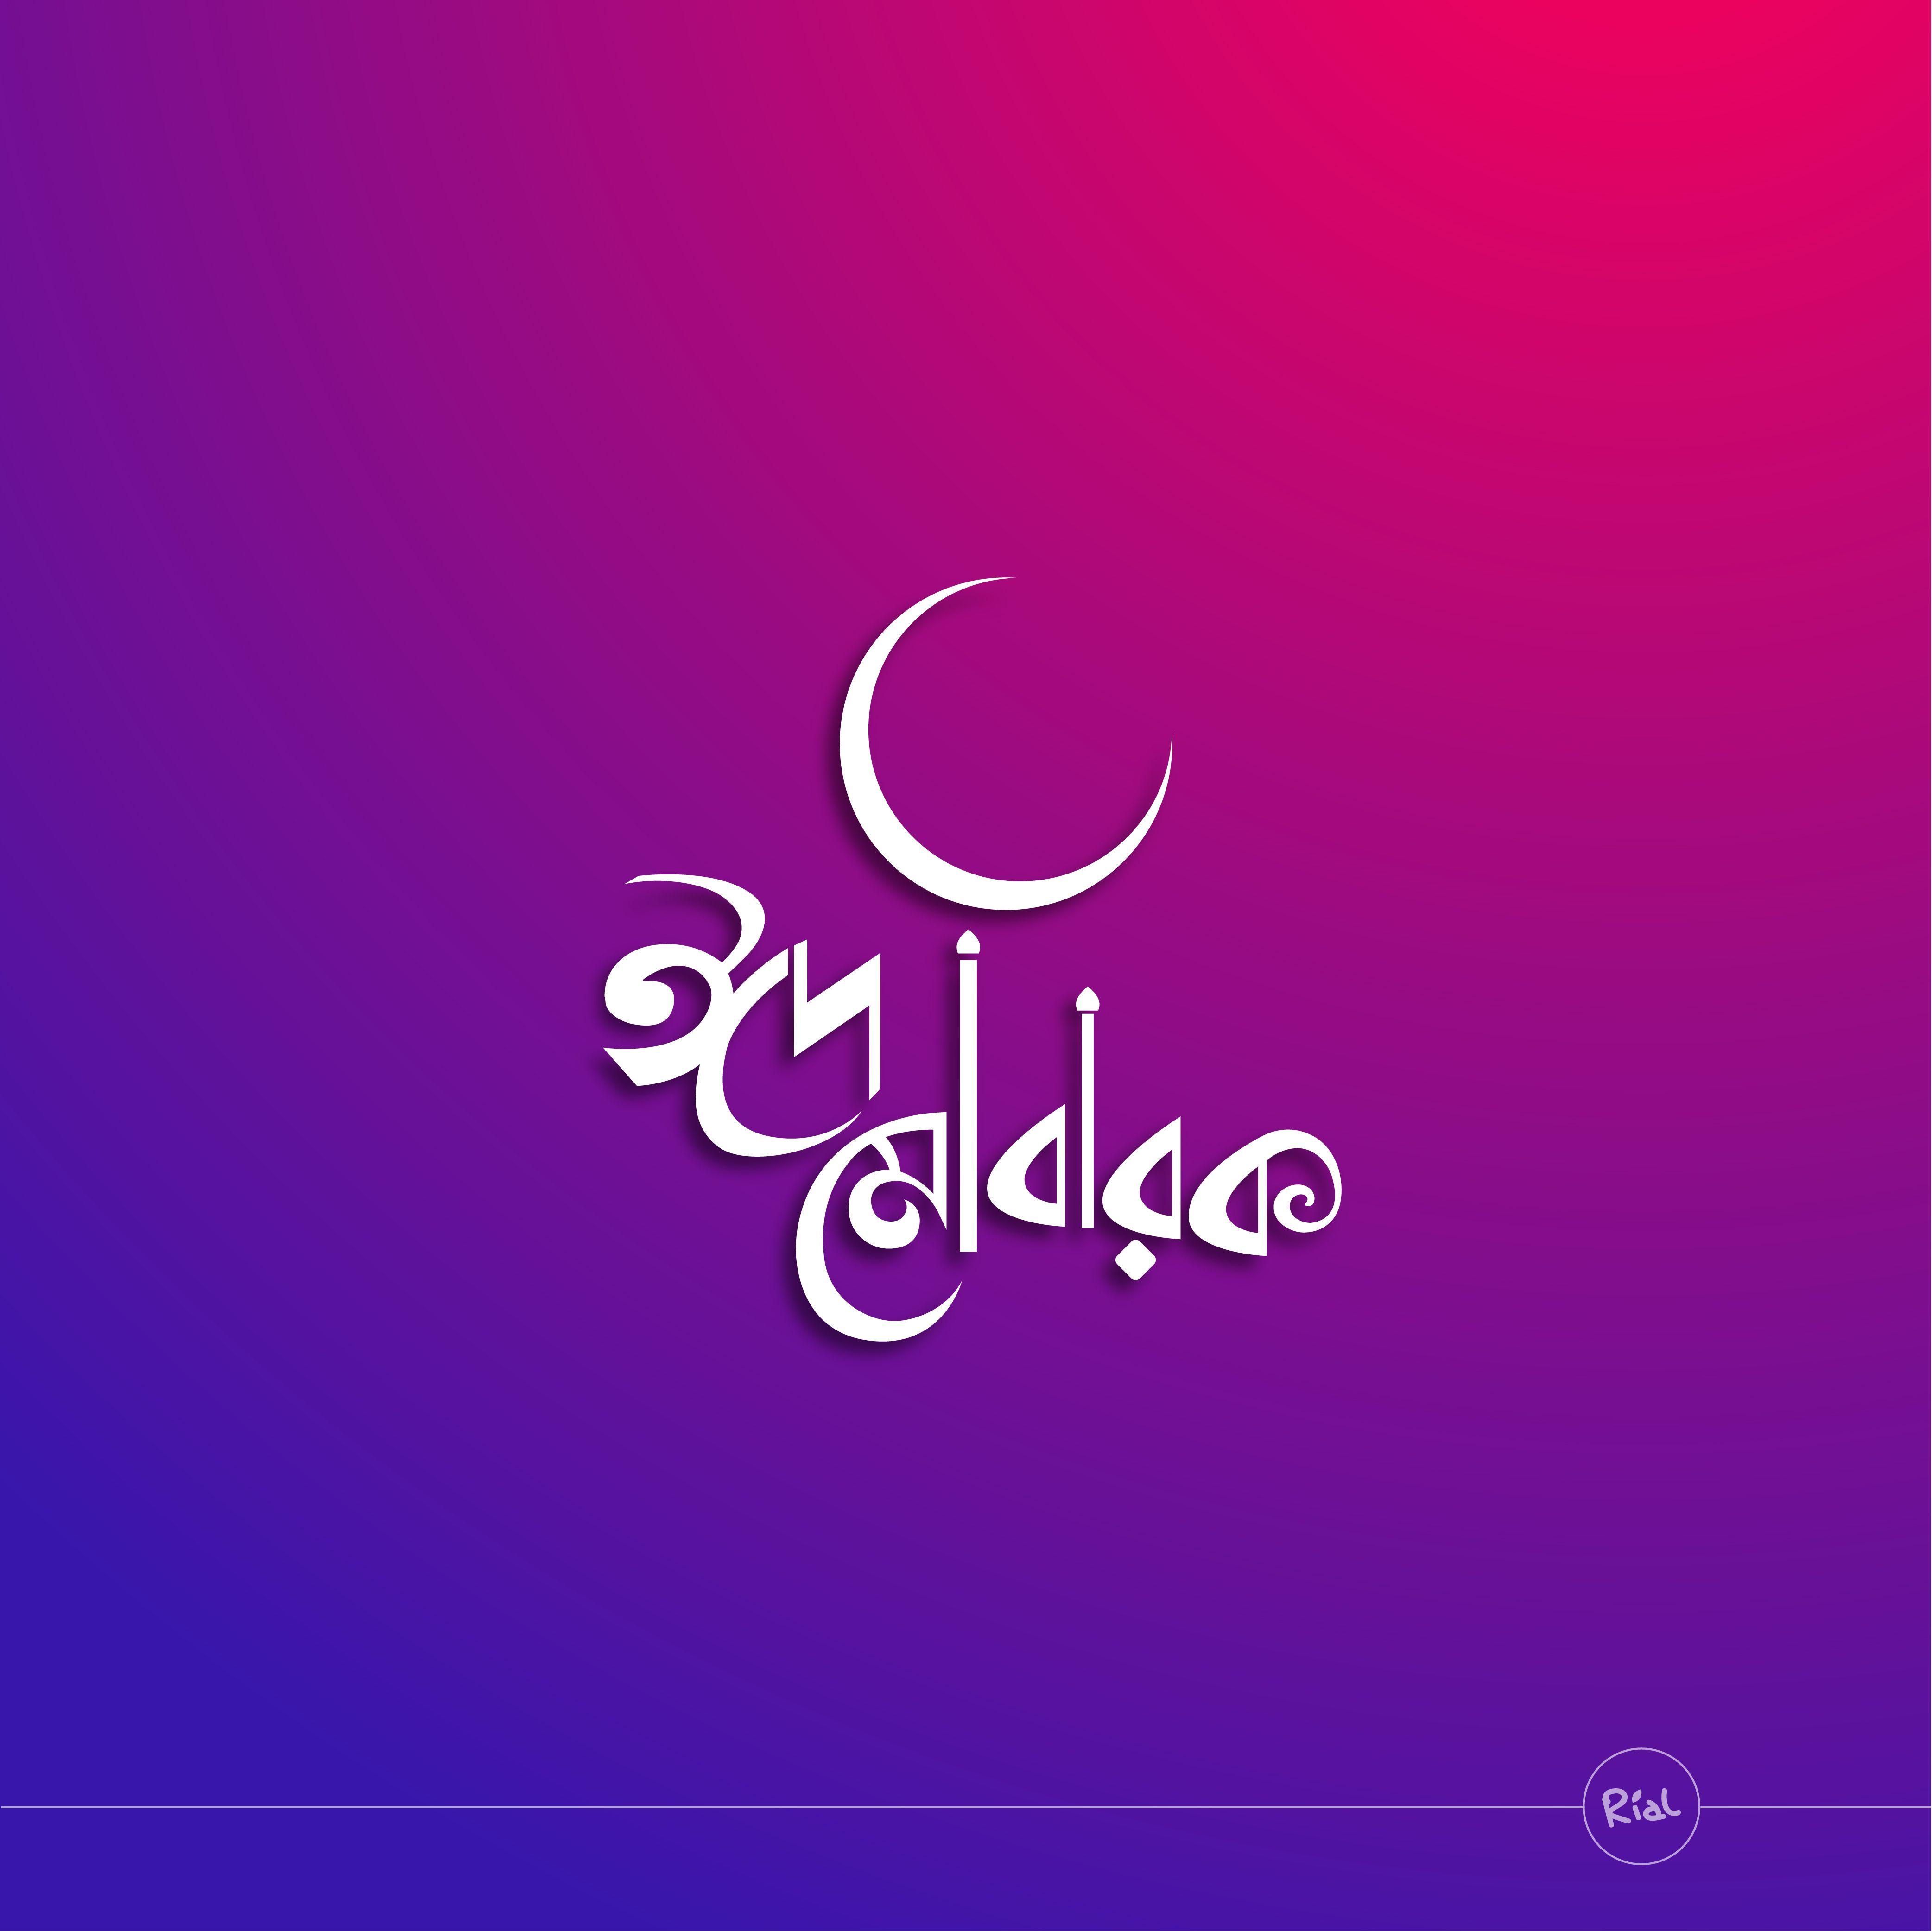 Bangla Calligraphy 6 Eid Mubarak With Images Hand Lettering